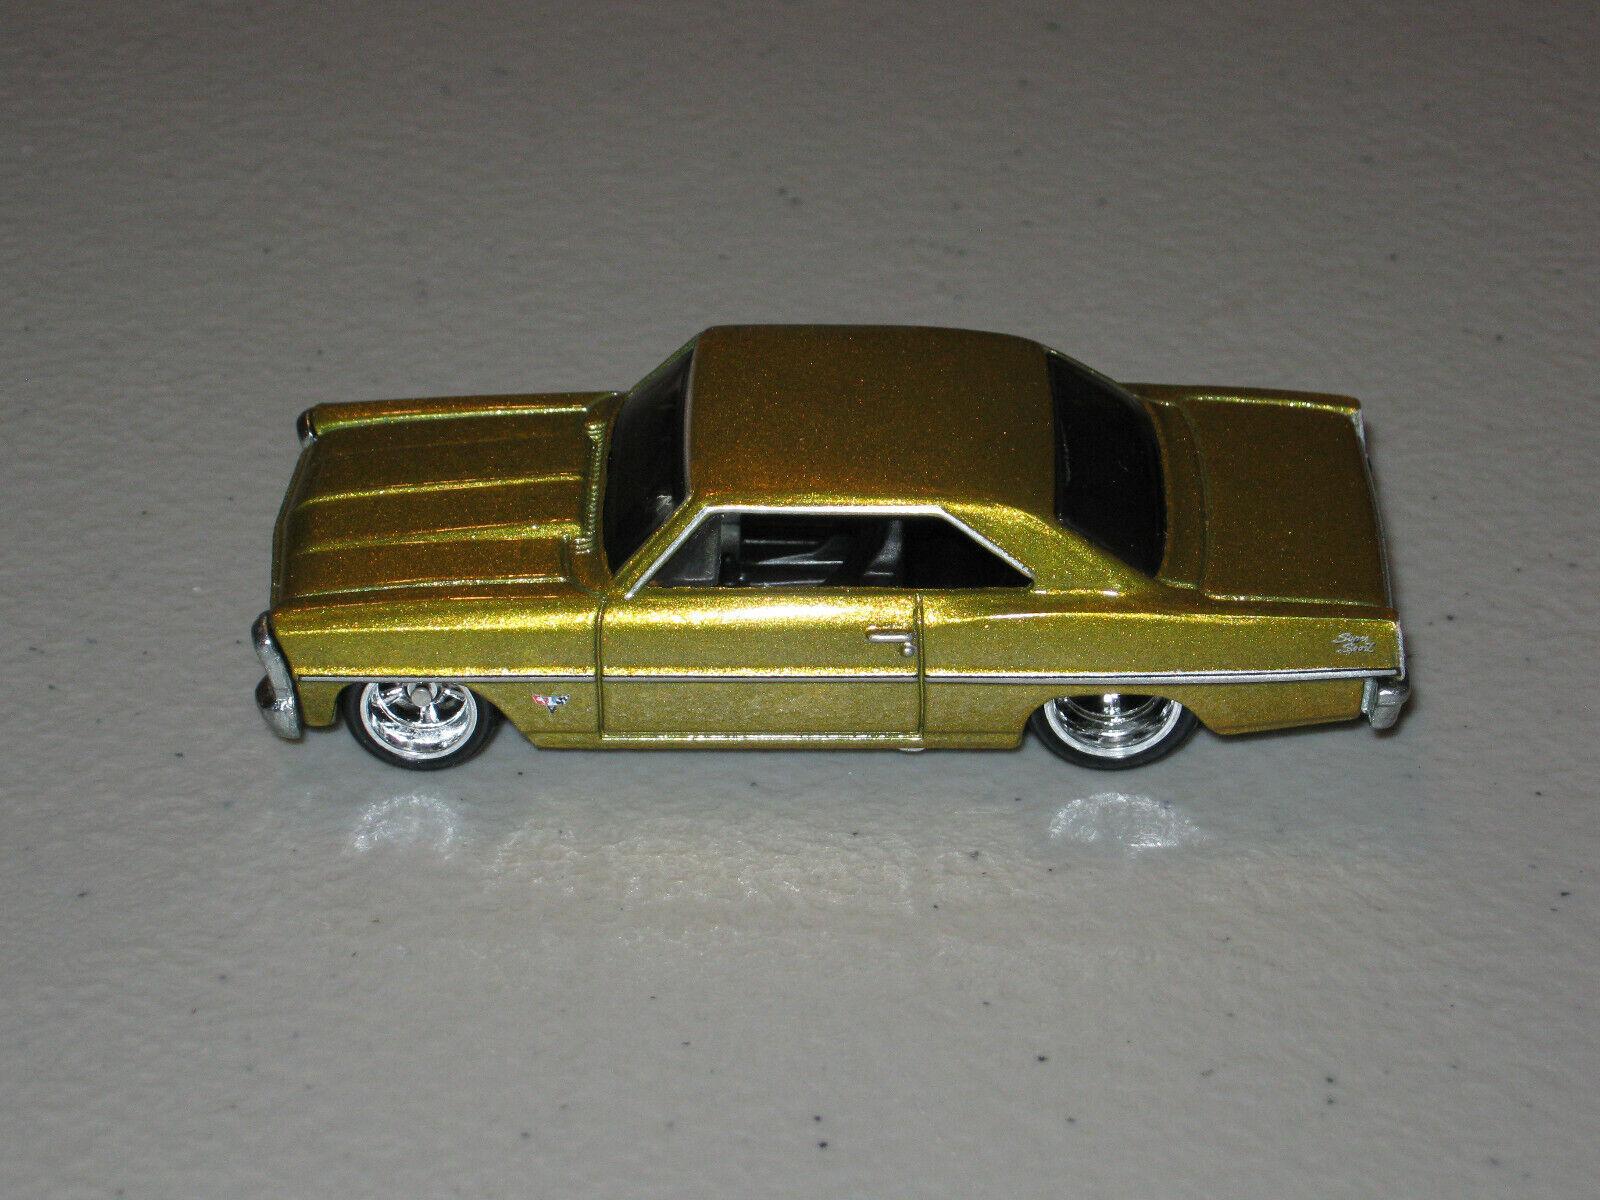 Hot Wheels Premium Fast Furious Motor City Muscle 1966 66 Chevy Nova II - $4.99